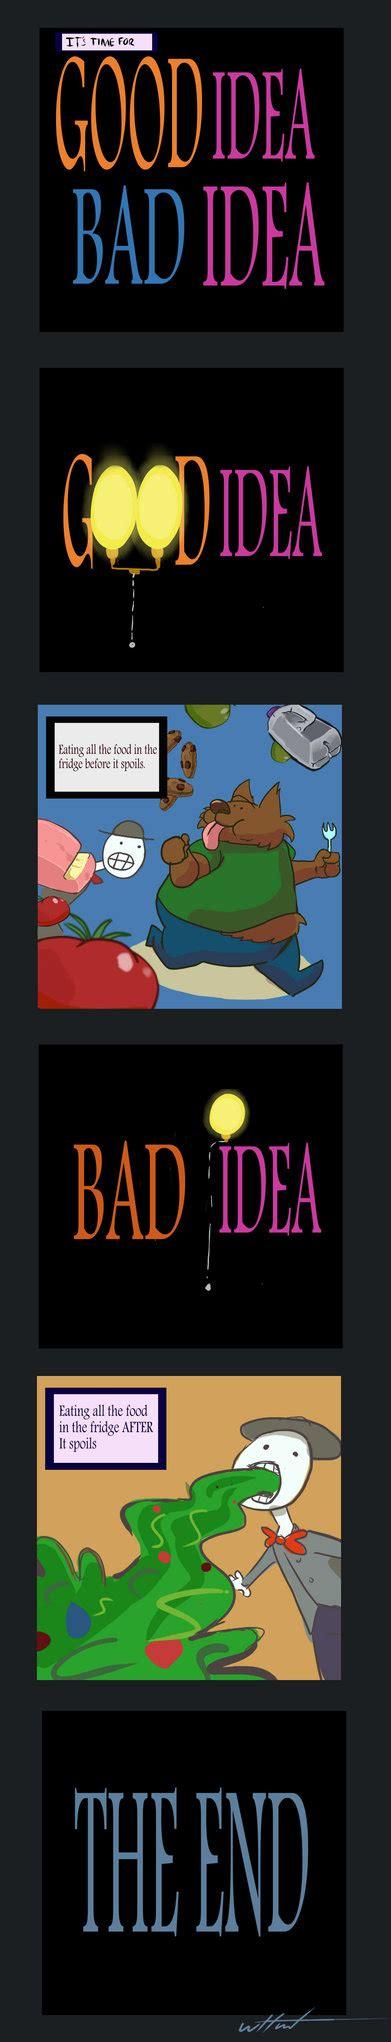 bad idea racing an 8 idea bad idea by digi on deviantart